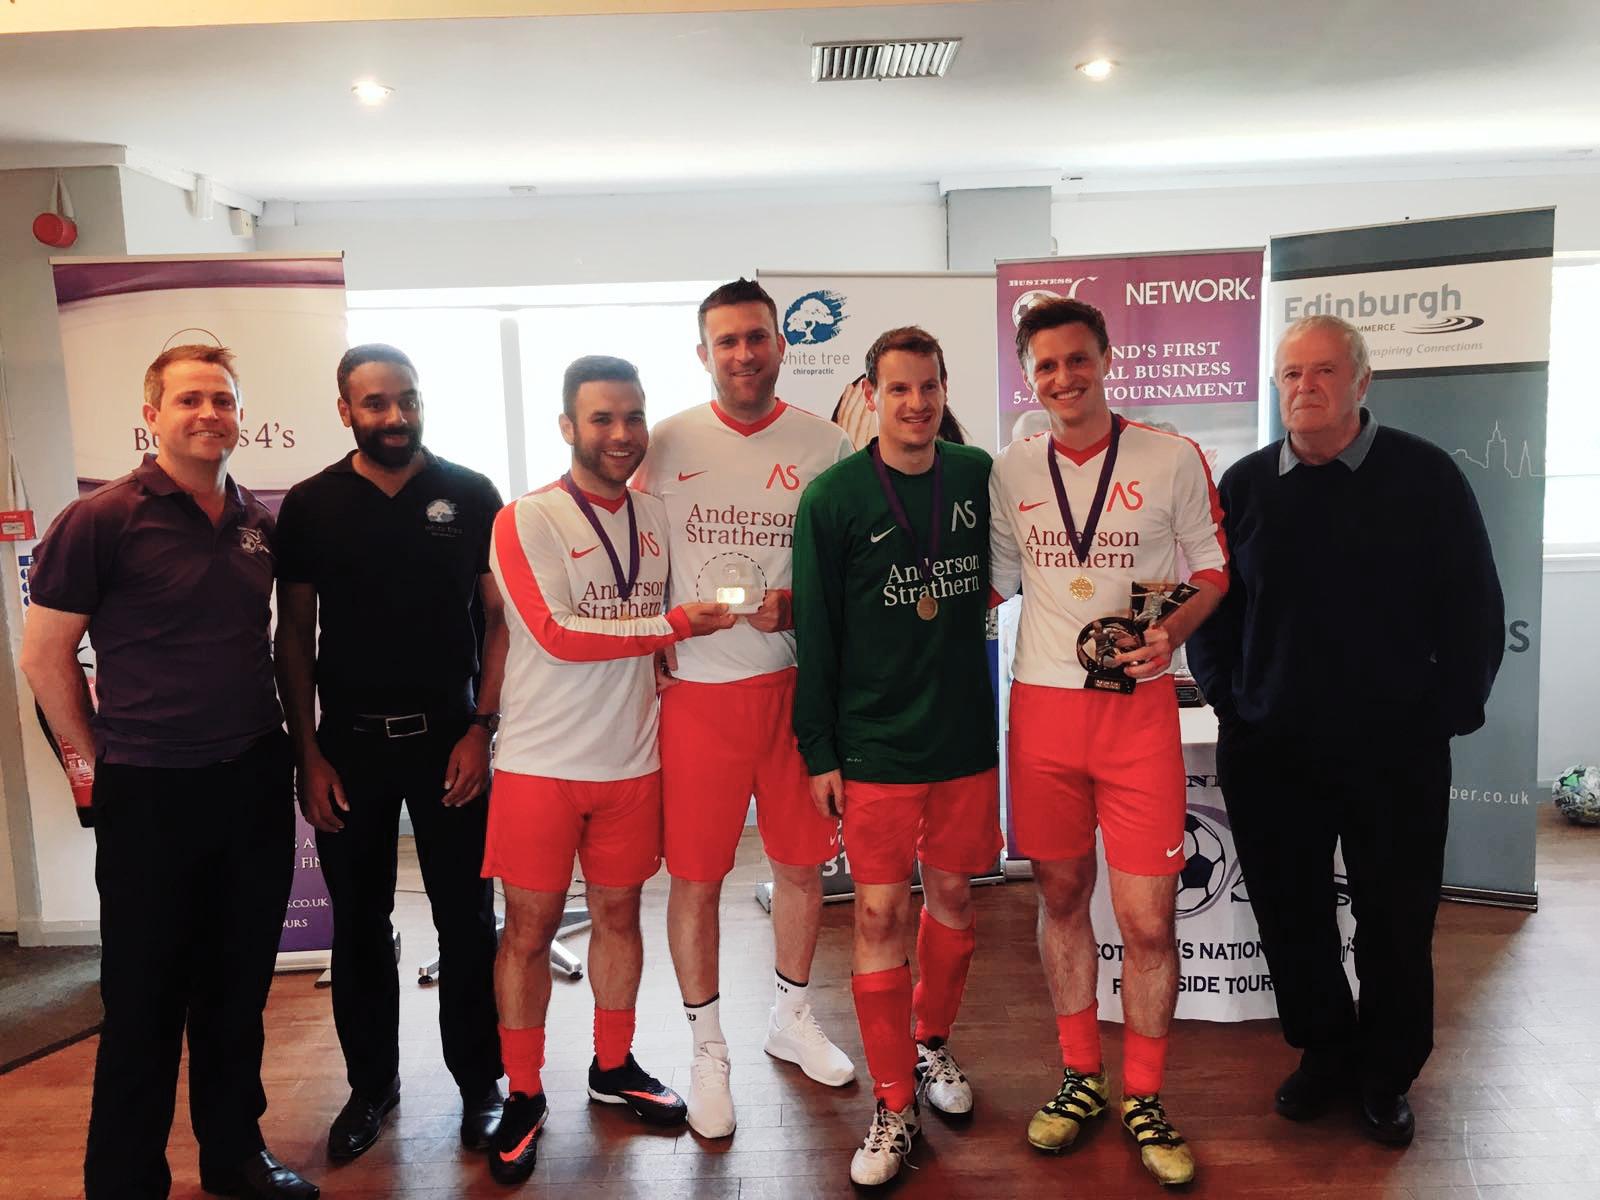 Anderson Strathern Winners